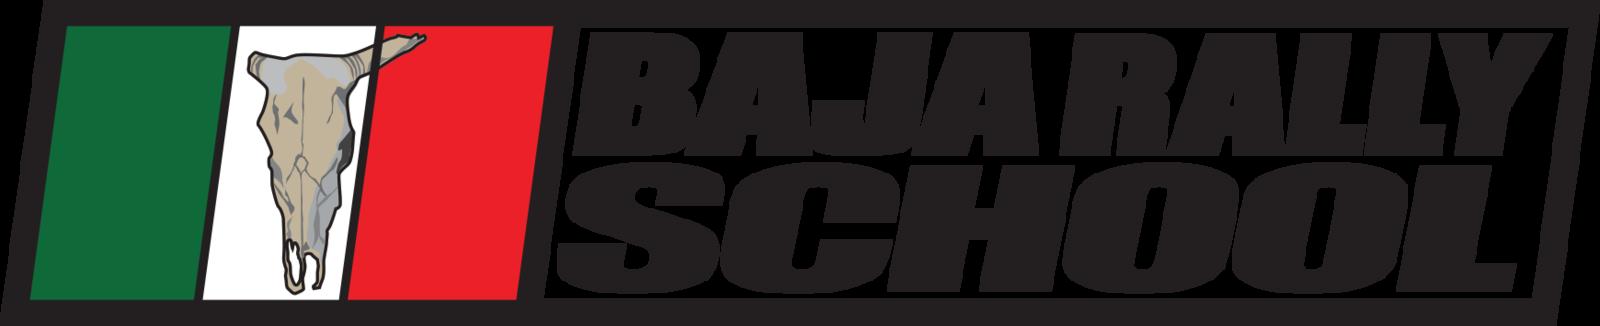 baja rally school 2017-3.png